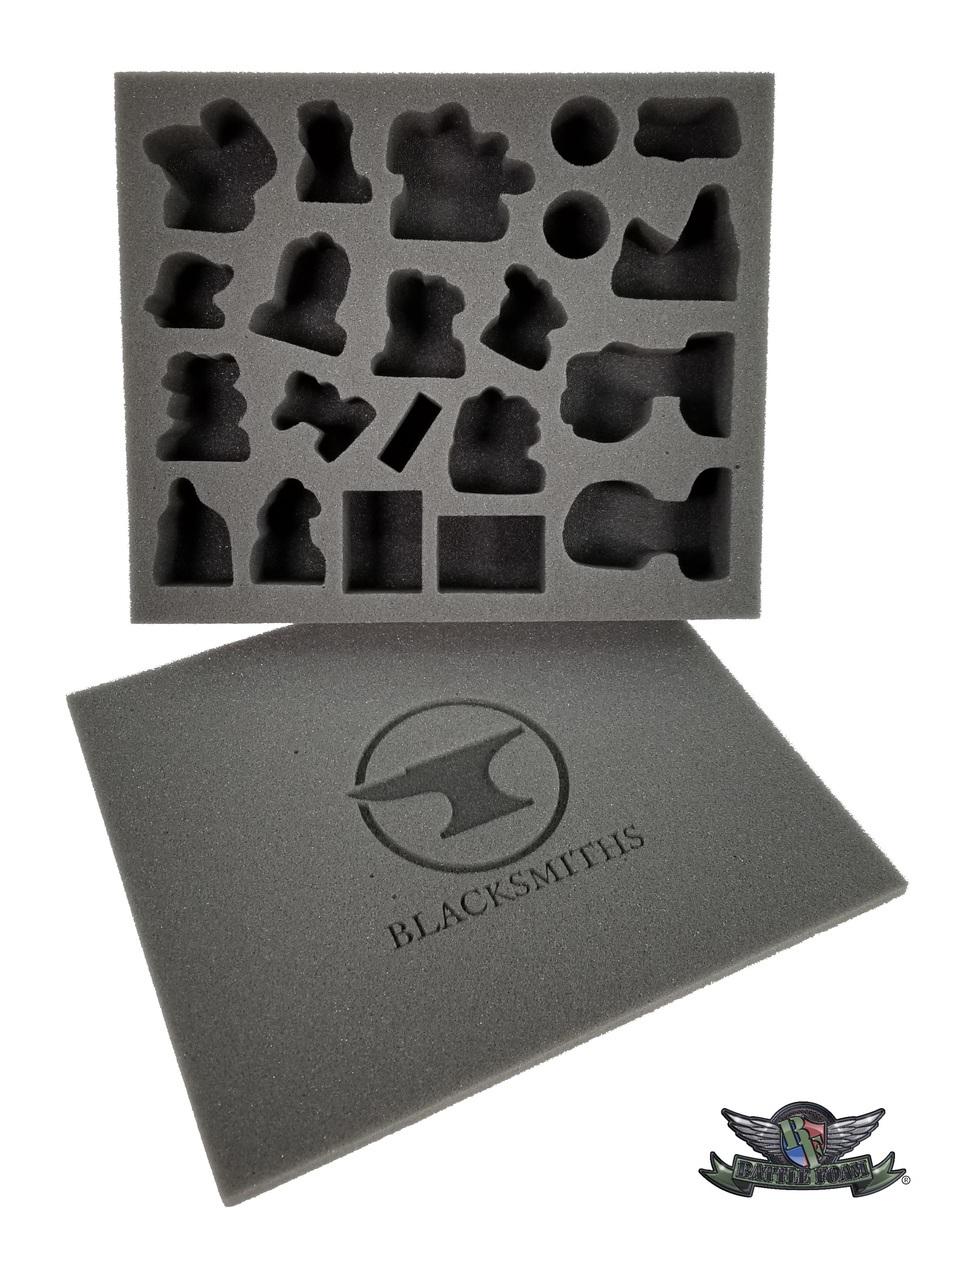 Blacksmiths Kit.jpg